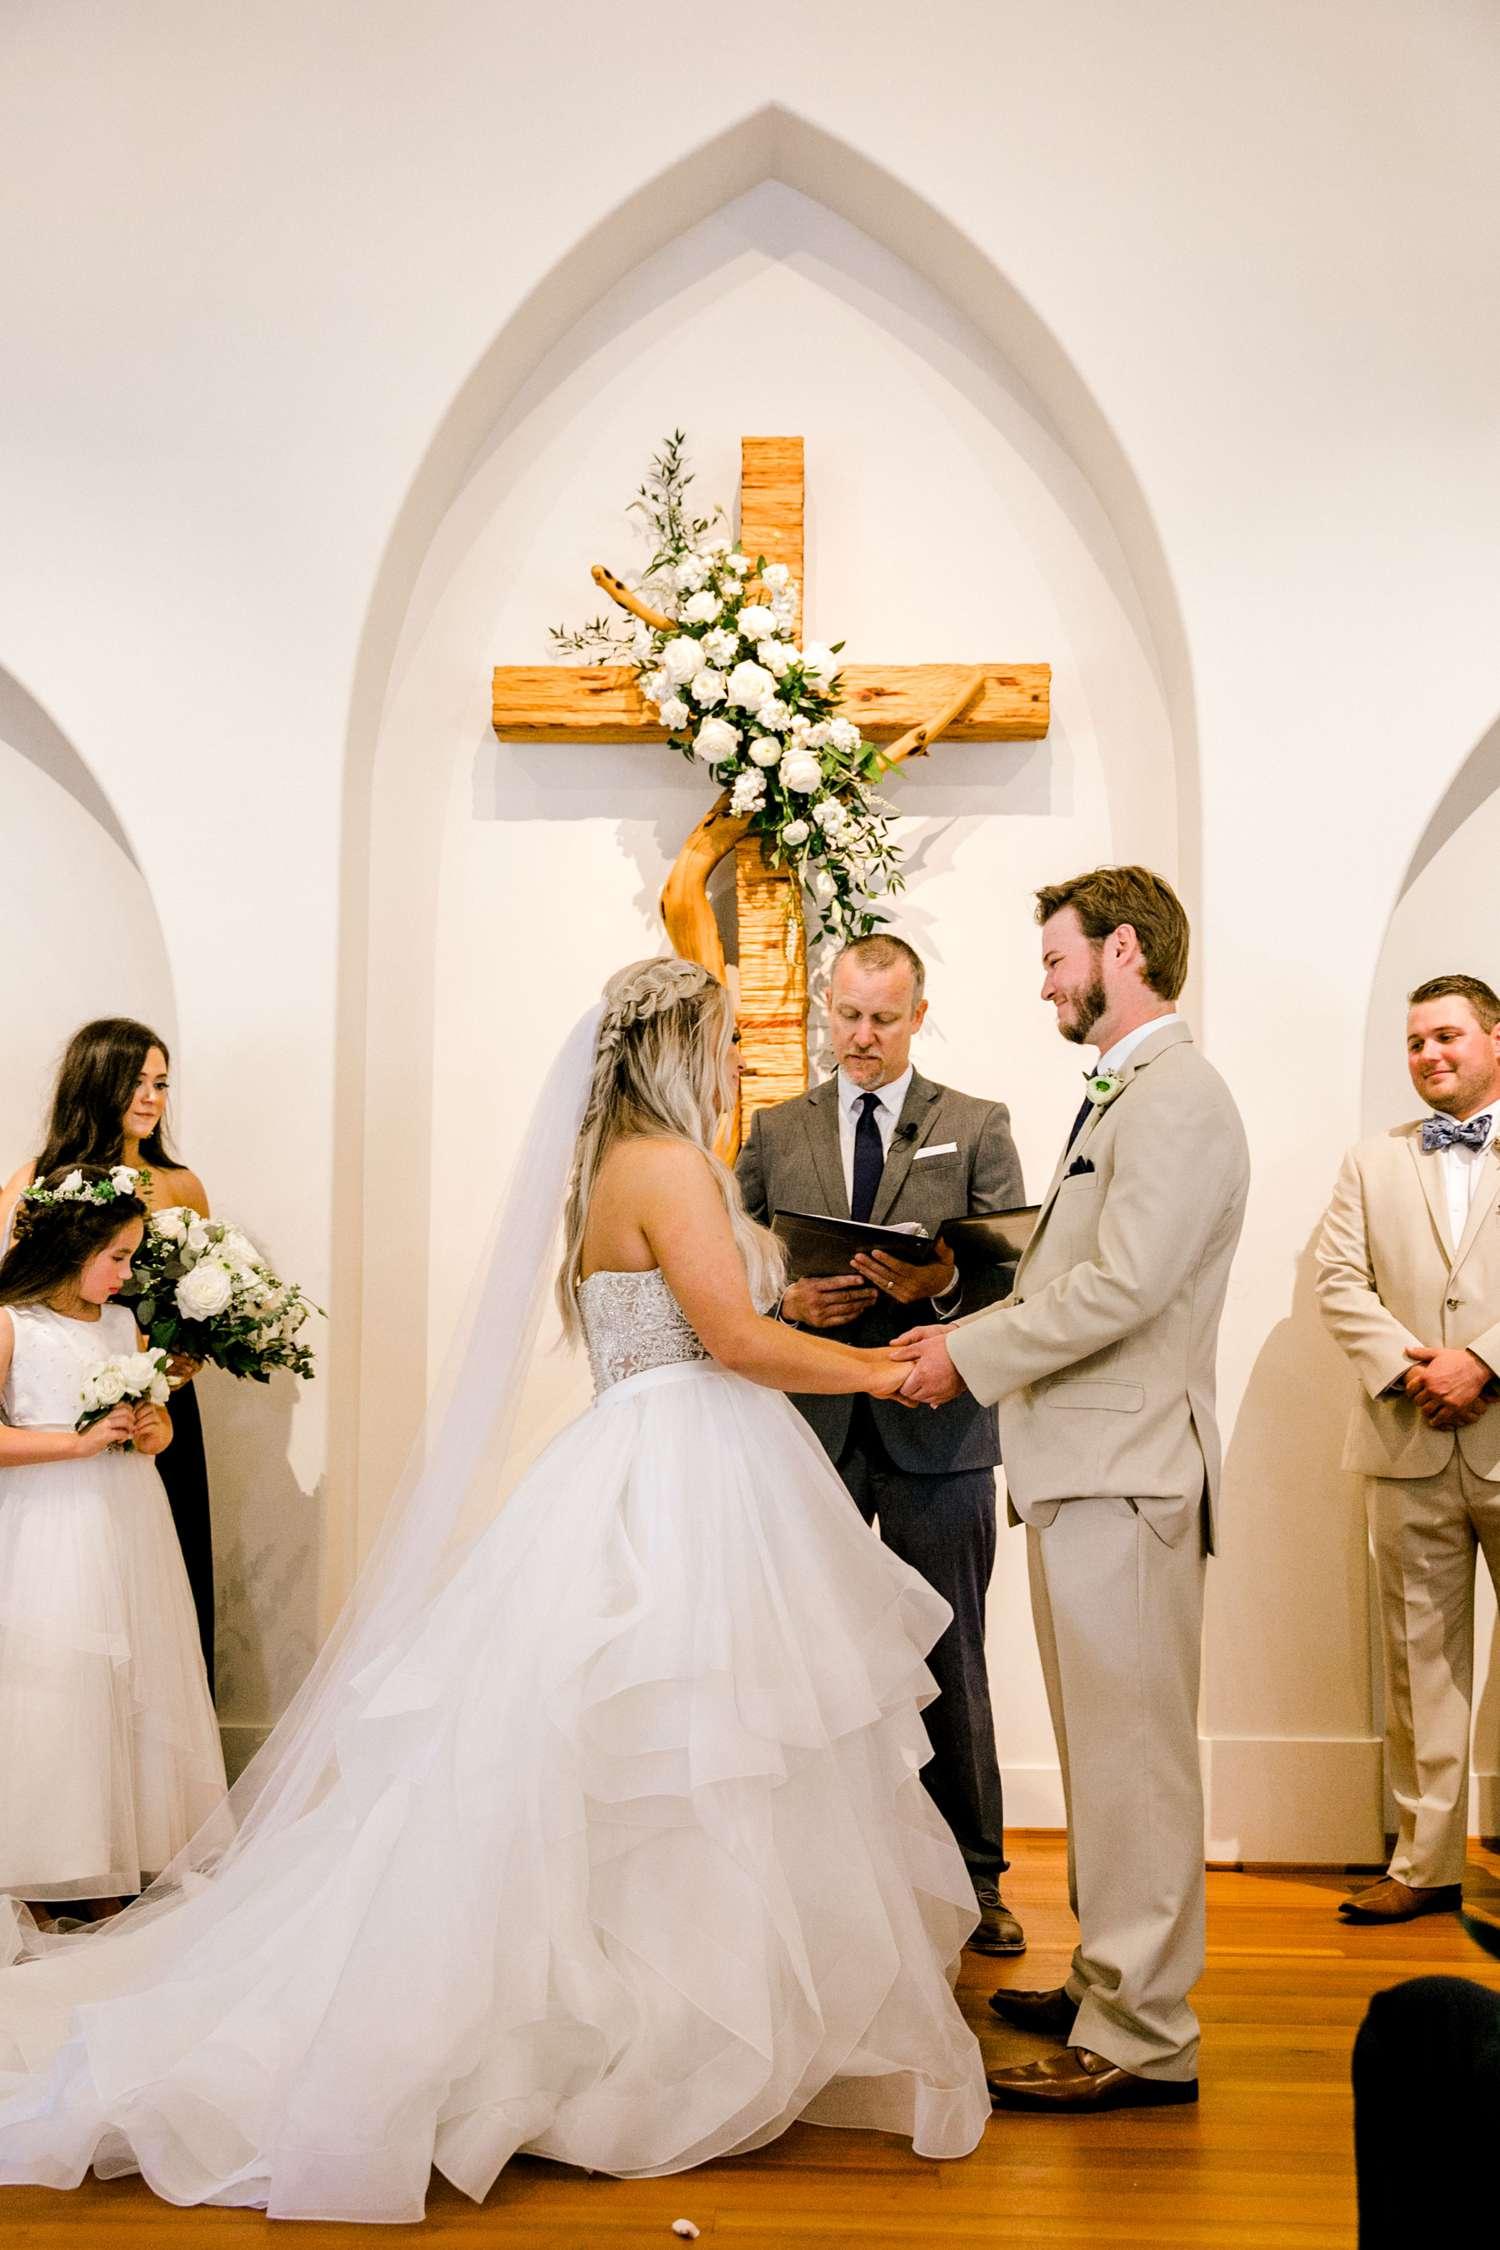 HAYLEE+JUSTIN+GREGORY+HERITAGE_HAUS_AUSTIN_TEXAS_WEDDING_0075.jpg